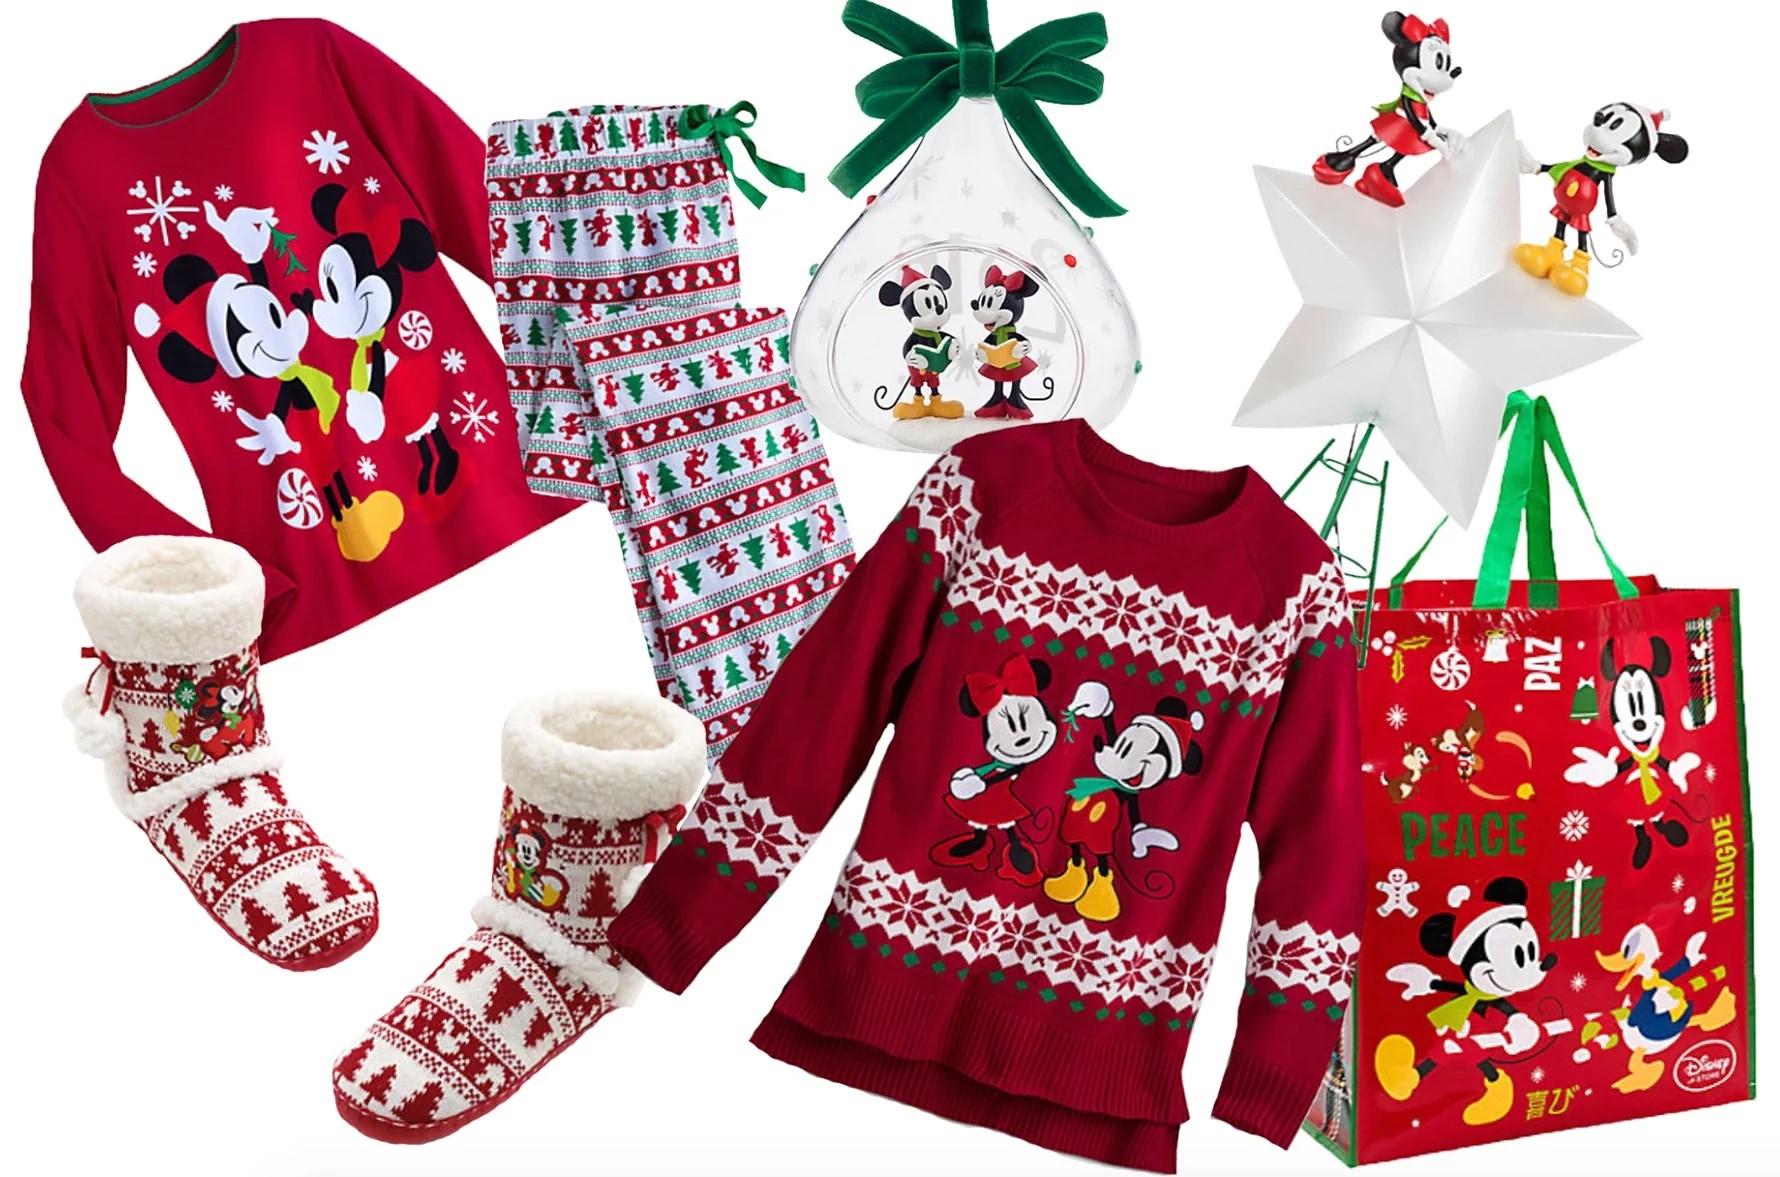 Disney Friday: Disney Store Christmas Wishes